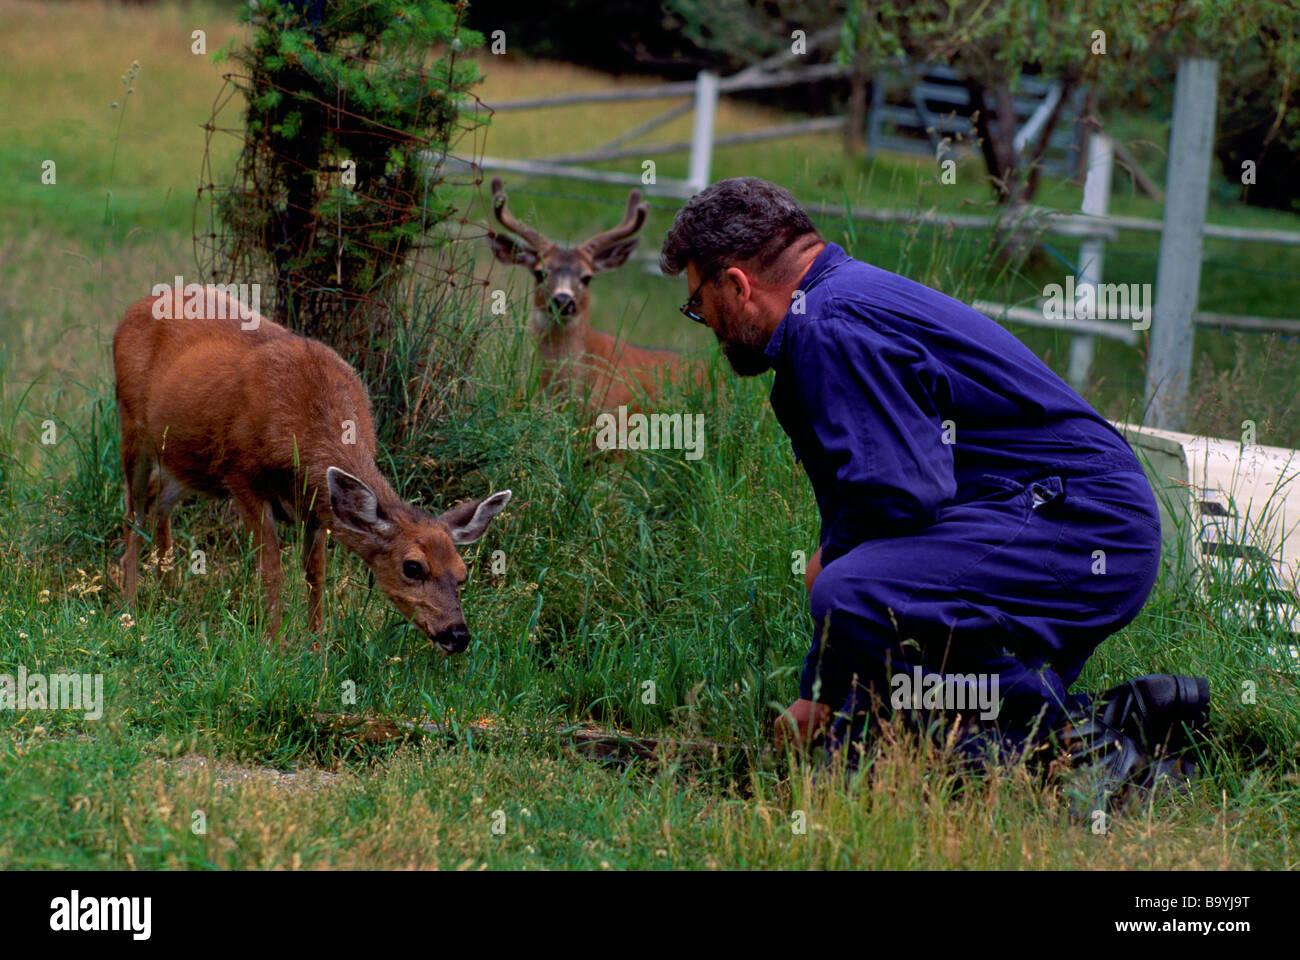 Man talking to Tame Wild Blacktail Deer (Black-Tailed Deer) (Odocoileus hemionus columbianus) in a Field Stock Photo